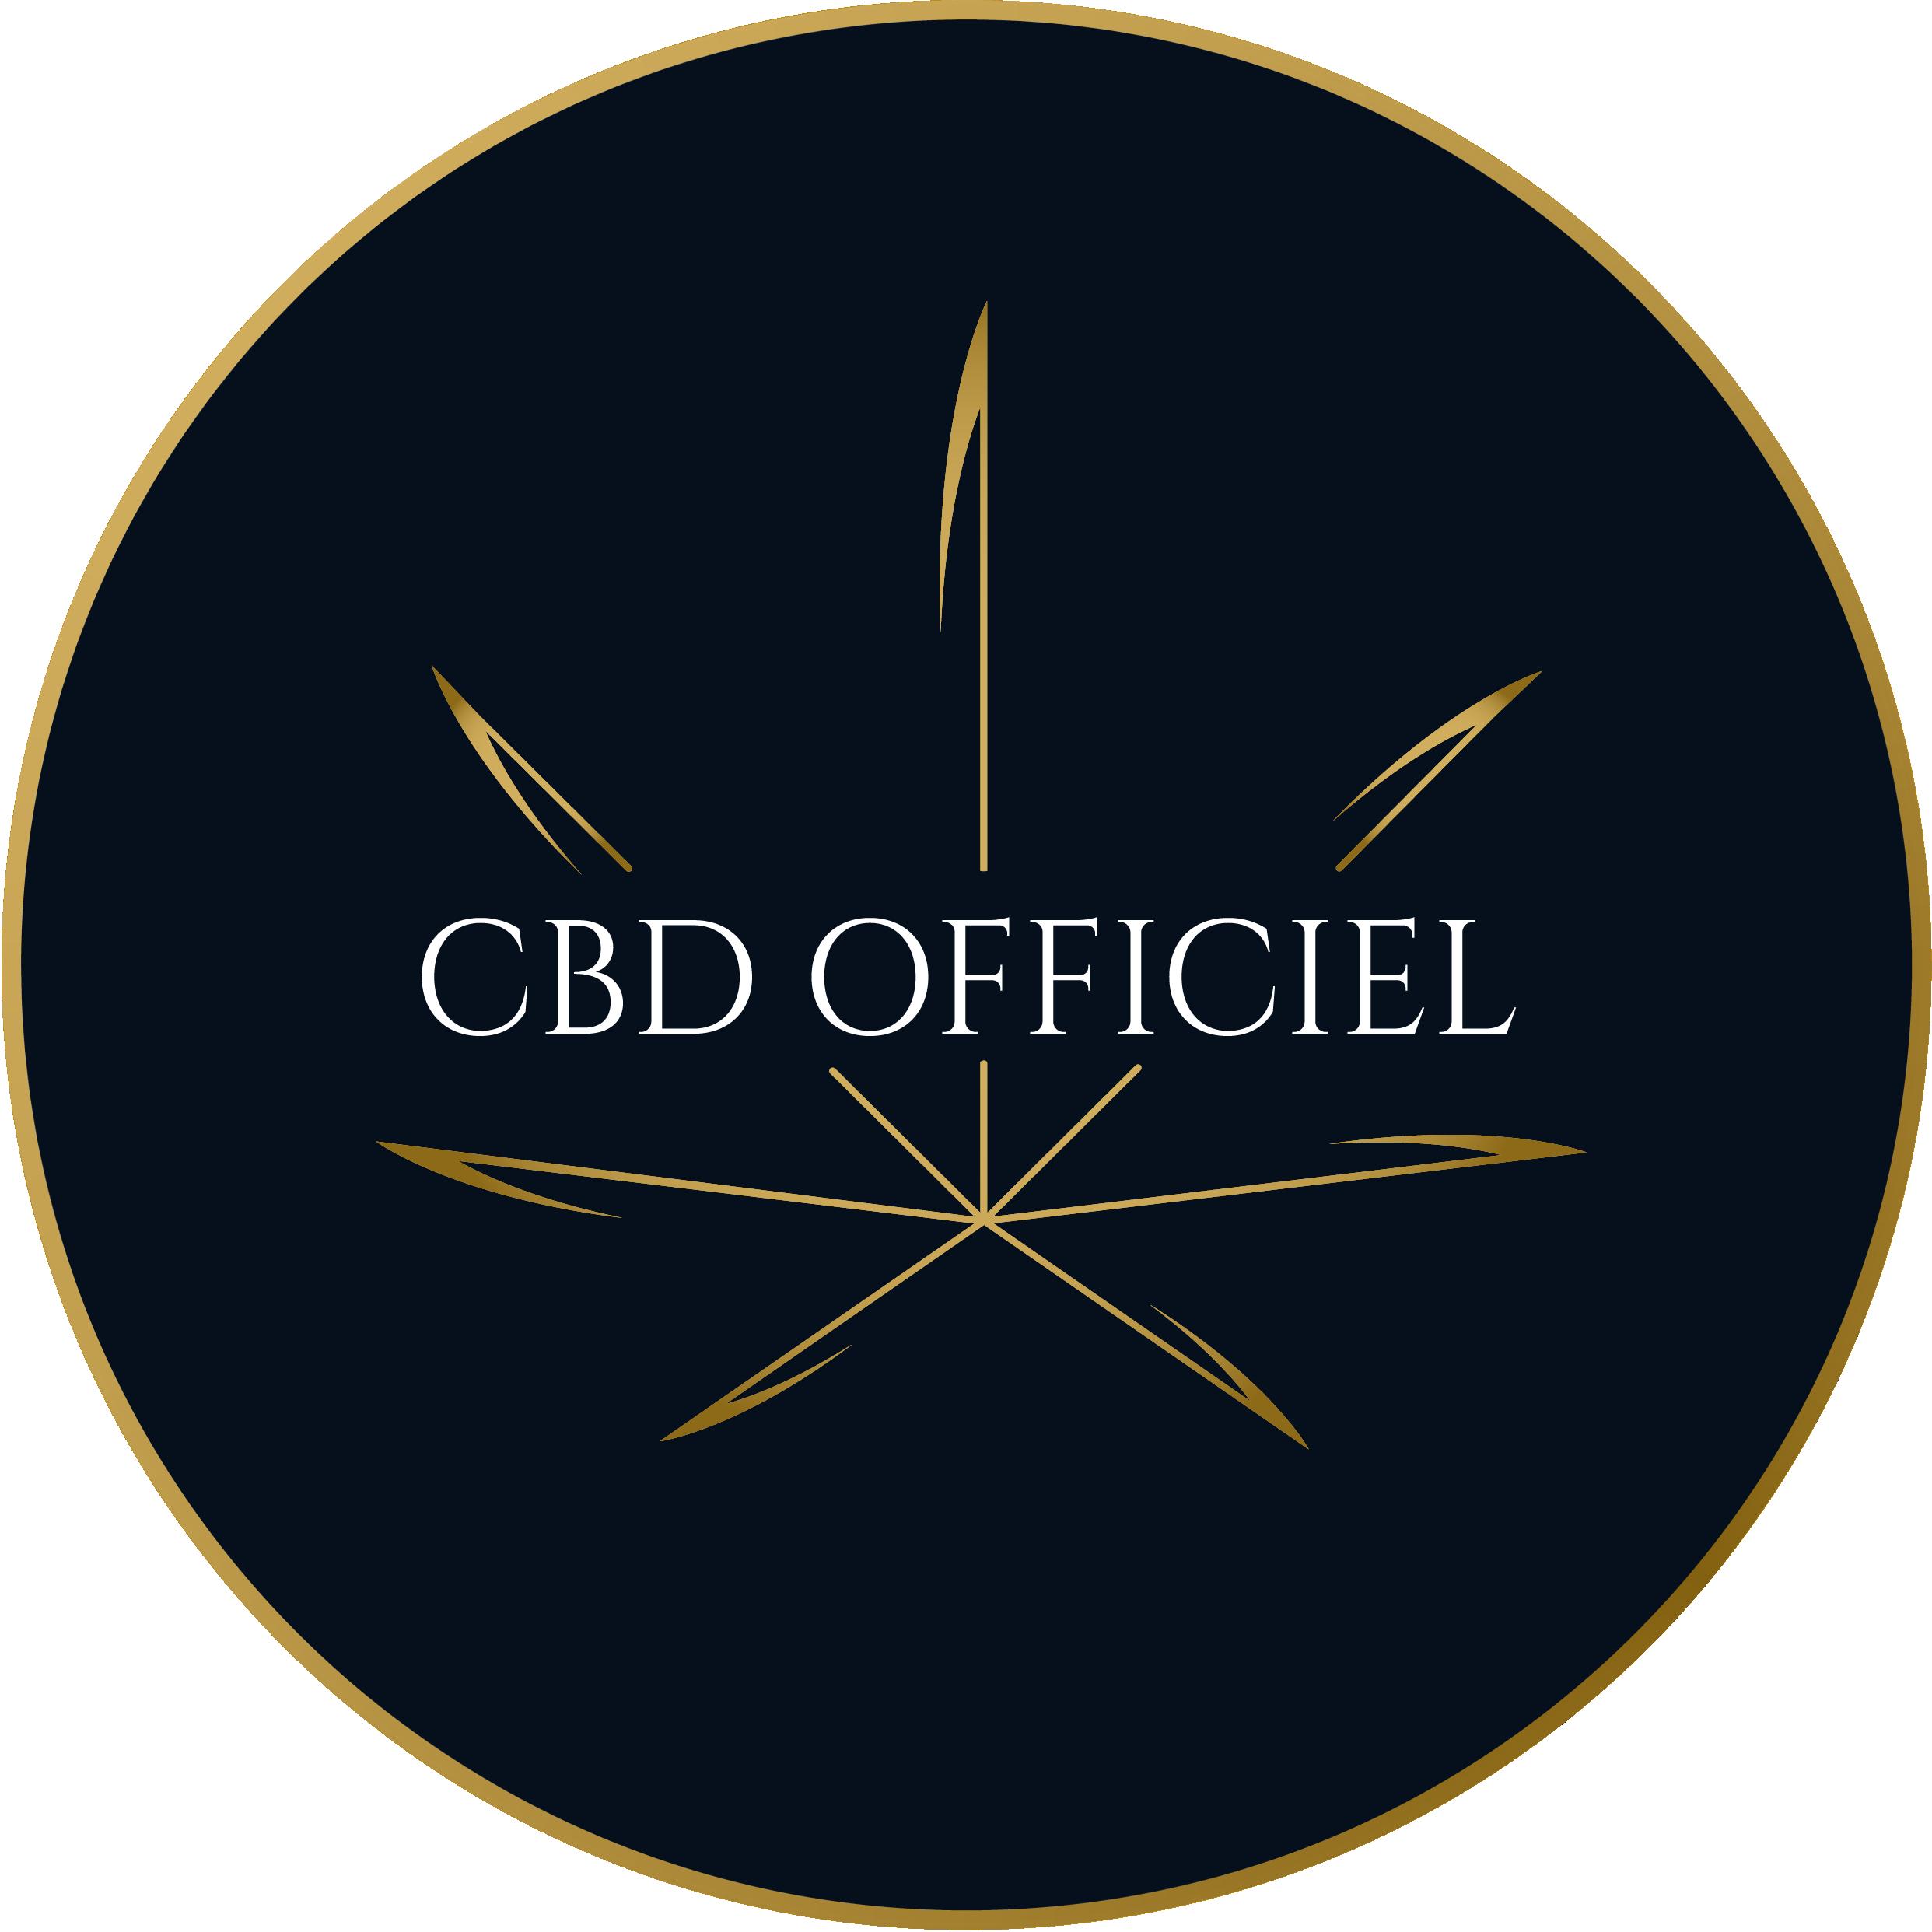 Cbd Officiel